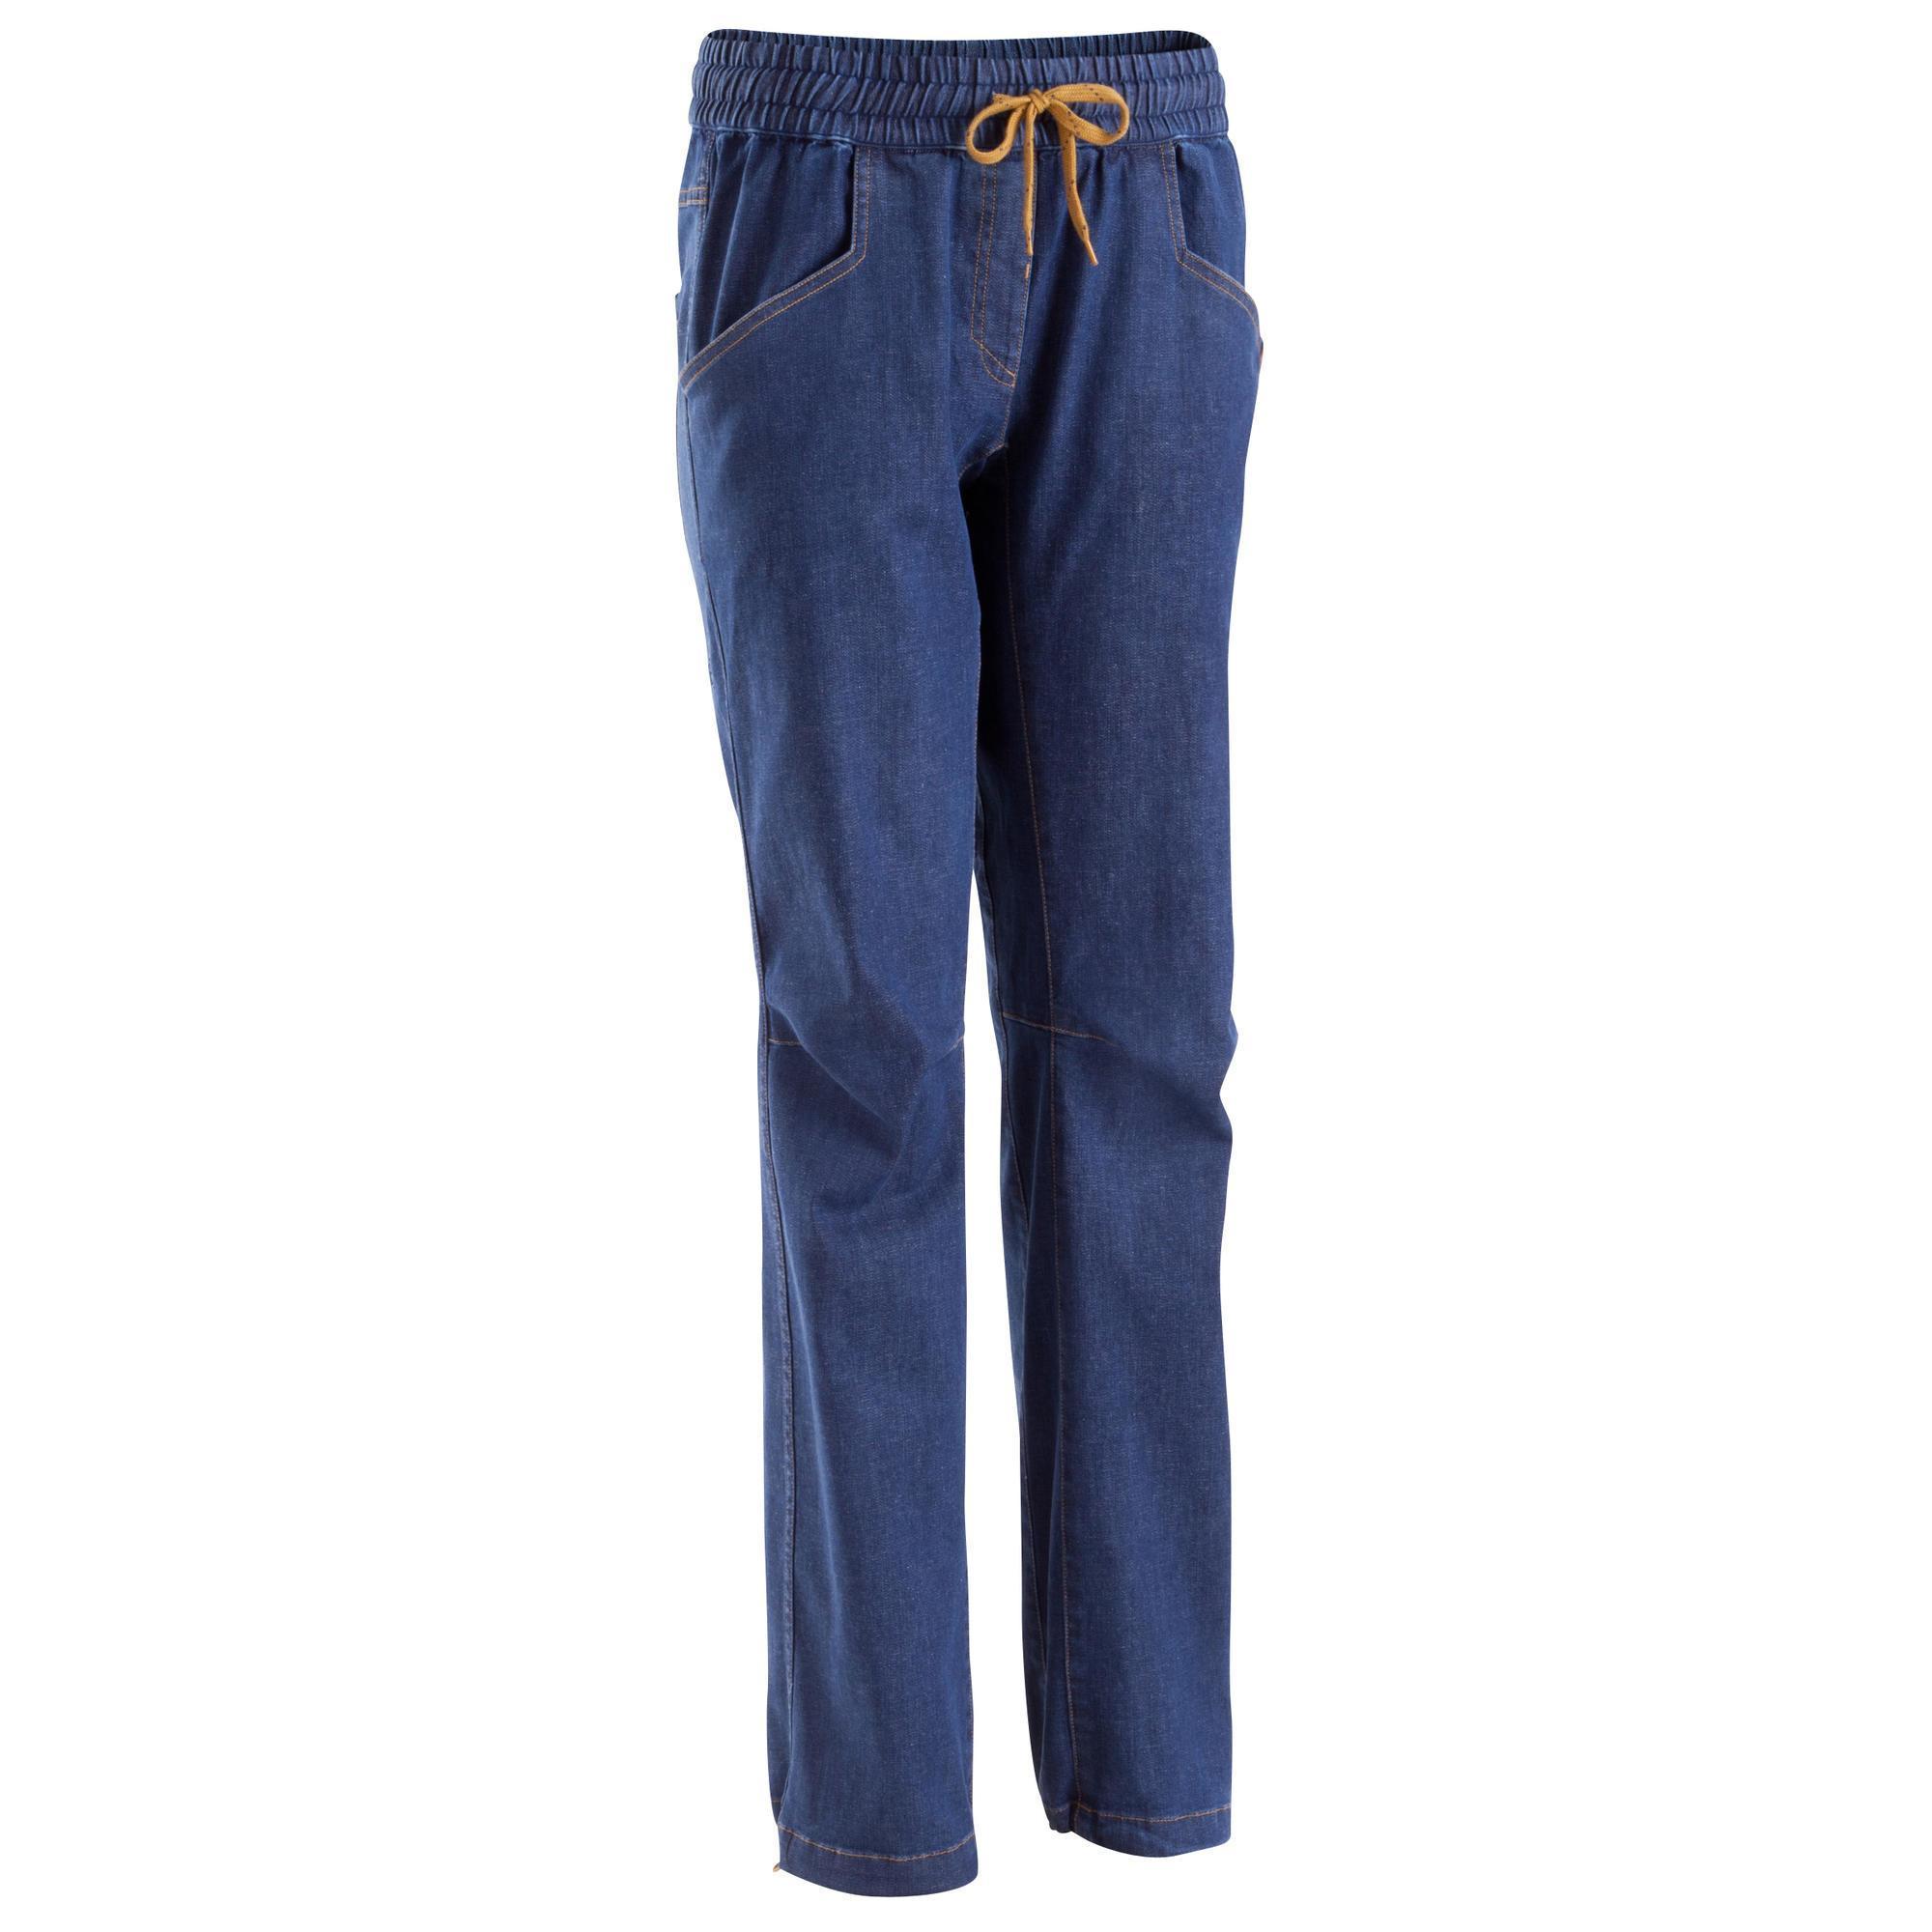 Simond Jeans Edge dames blauw